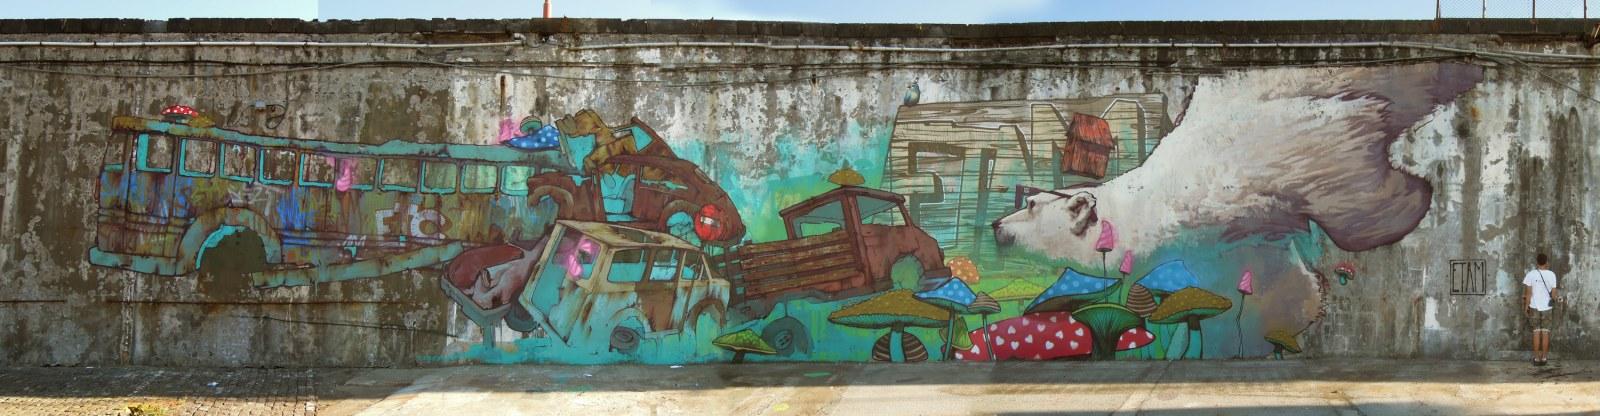 etam-cru-psychedelic-street-art-polarbear-jpg-1600-900